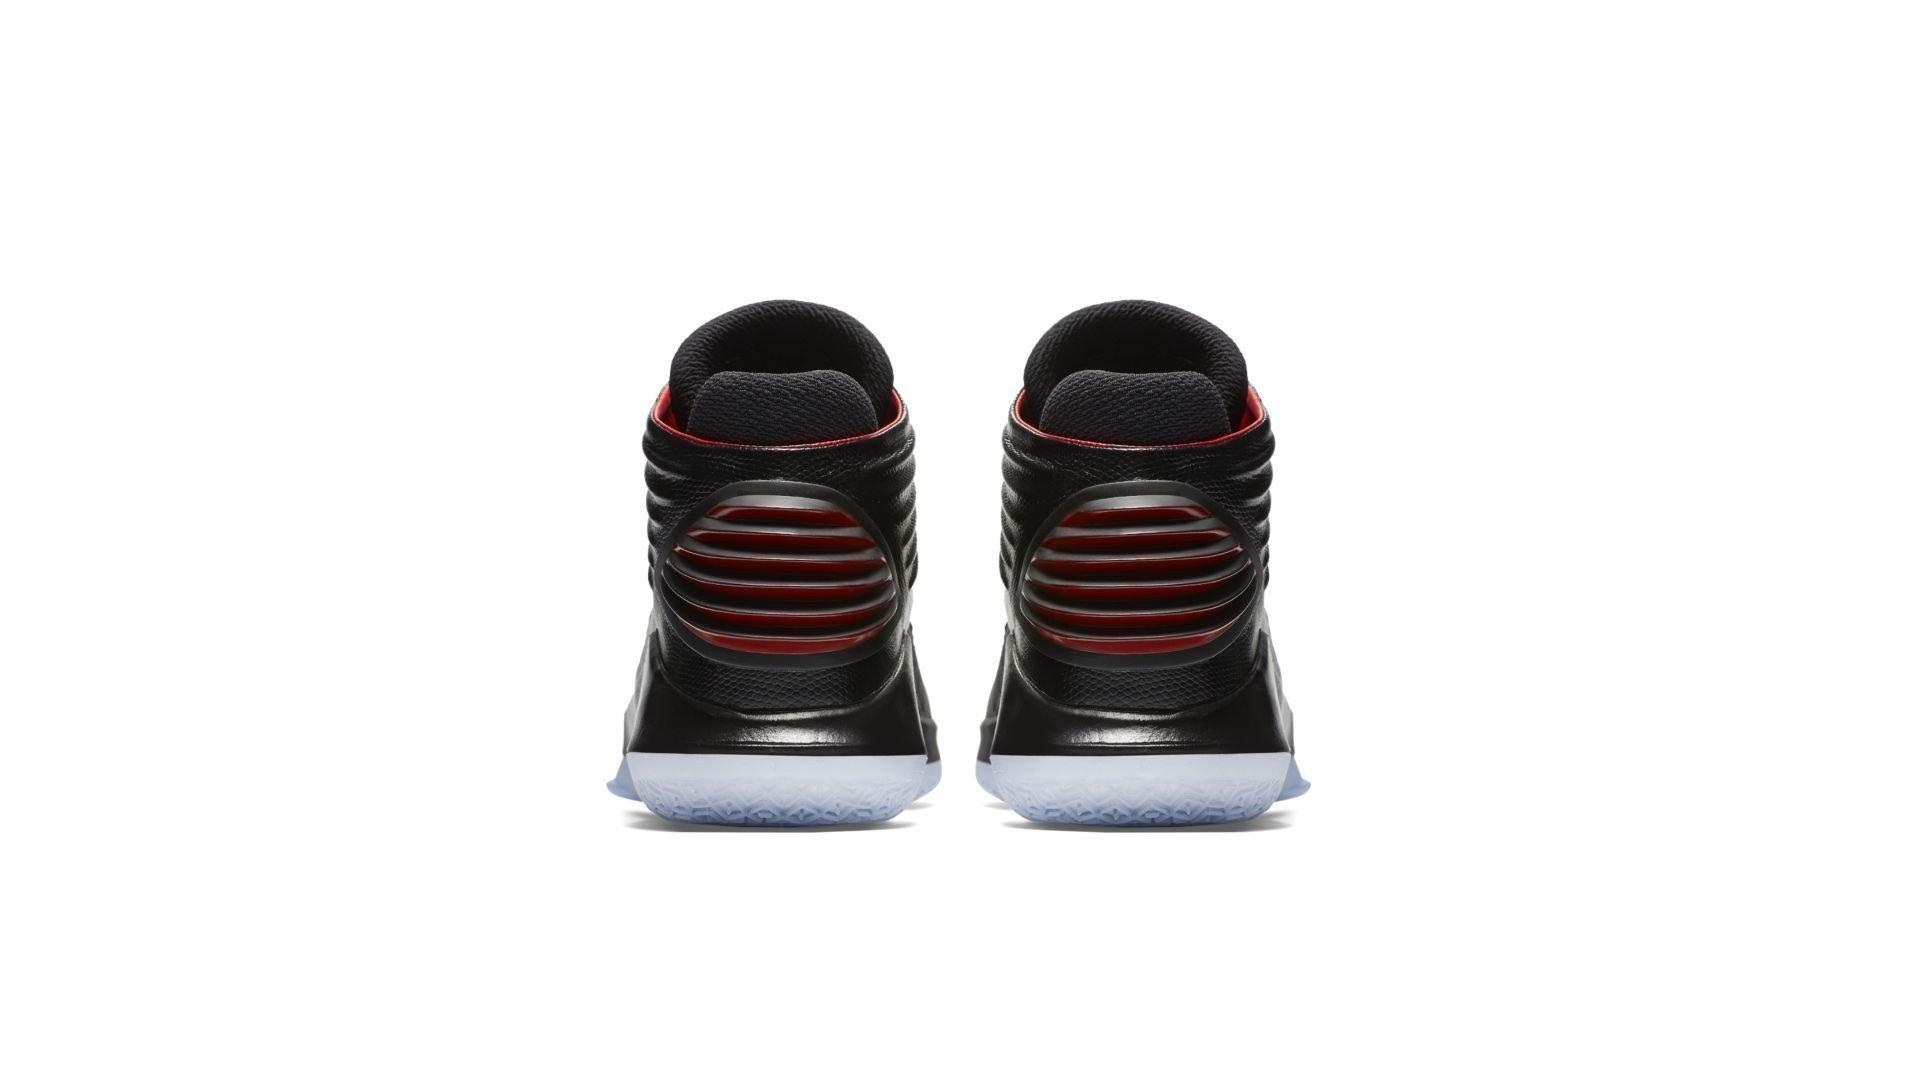 Jordan XXXII MJ Day (AA1253-001)